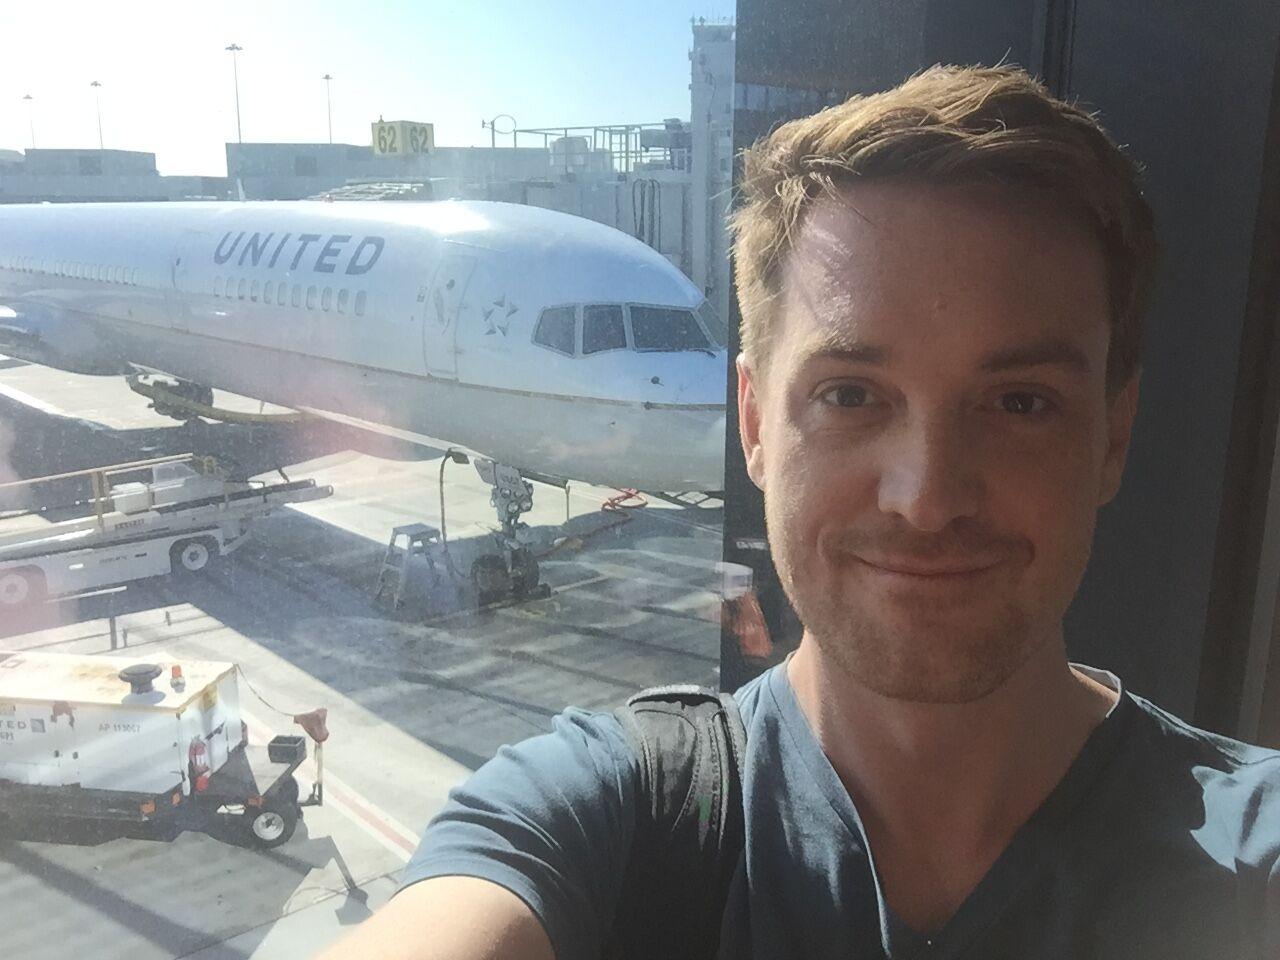 Chris Benjaminsen, the globe-trotting indie developer, on his way to Toronto.